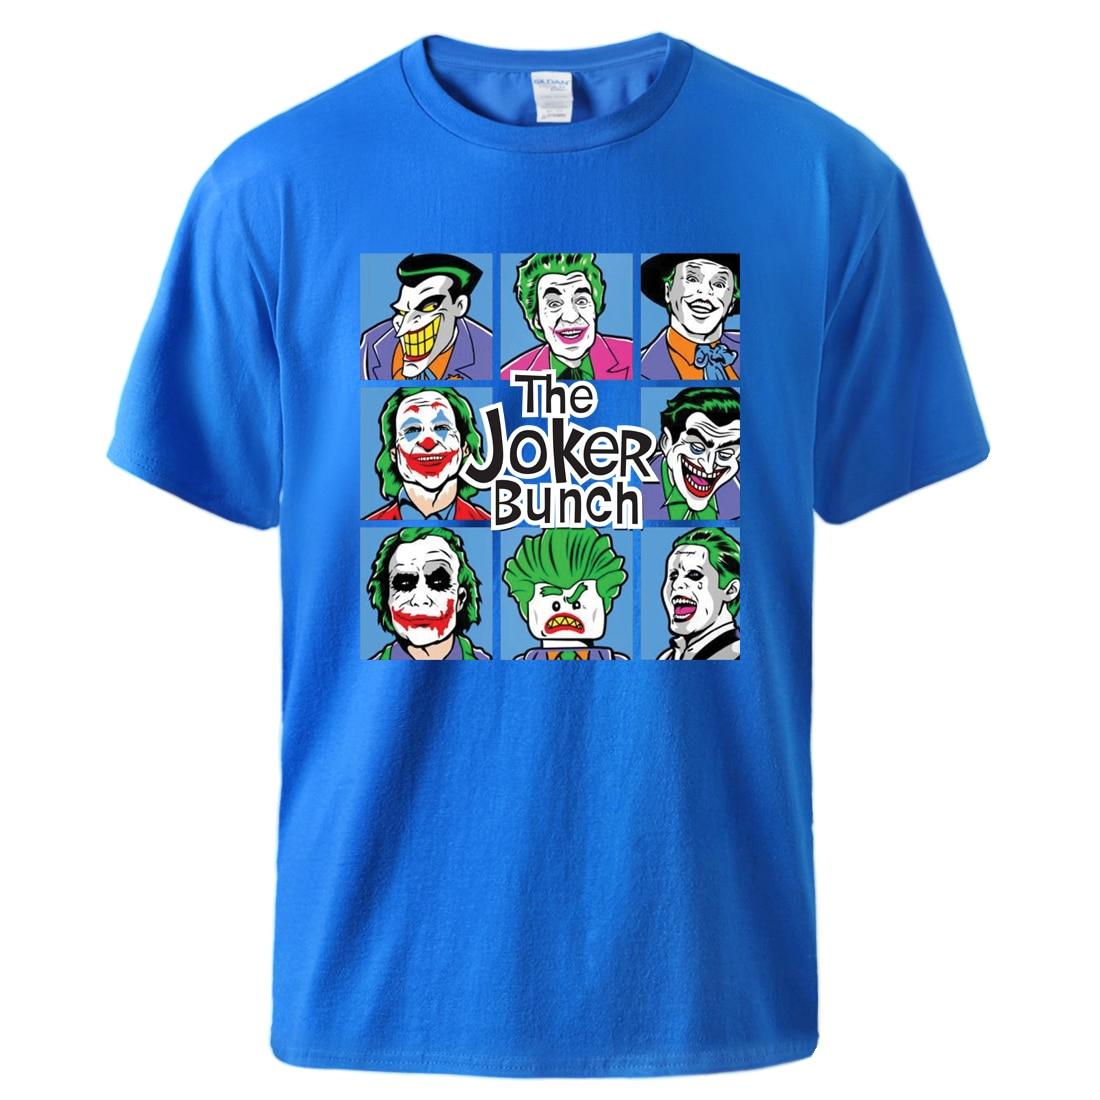 Funny The Joker Bunch T Shirt Man Causal Top Tee 2020 Man High Qaulity 100% Cotton Sportswear Tshirt Man Short Sleeve Casual Top